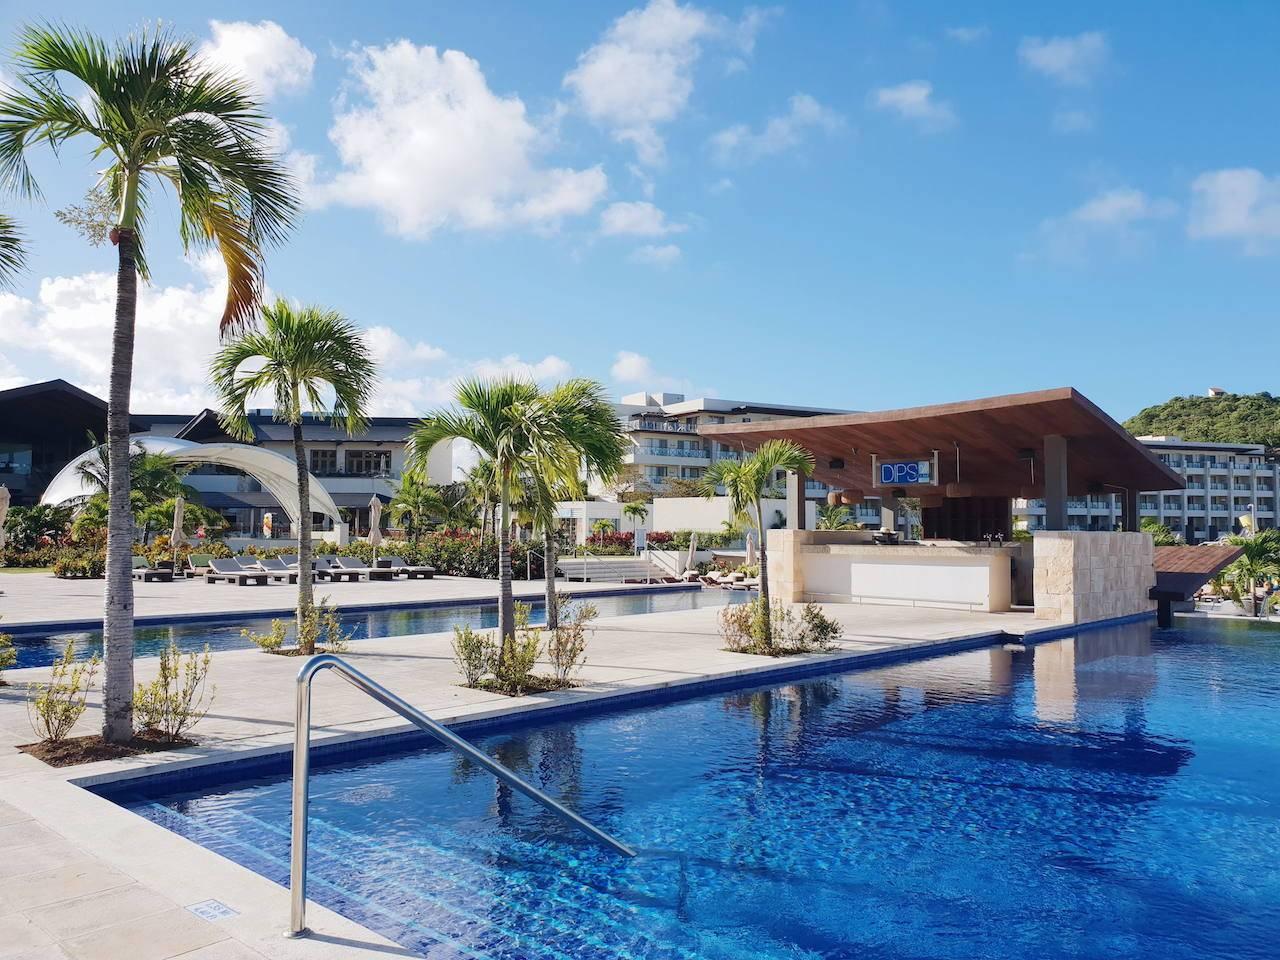 Royalton Saint Lucia hotel review: pools